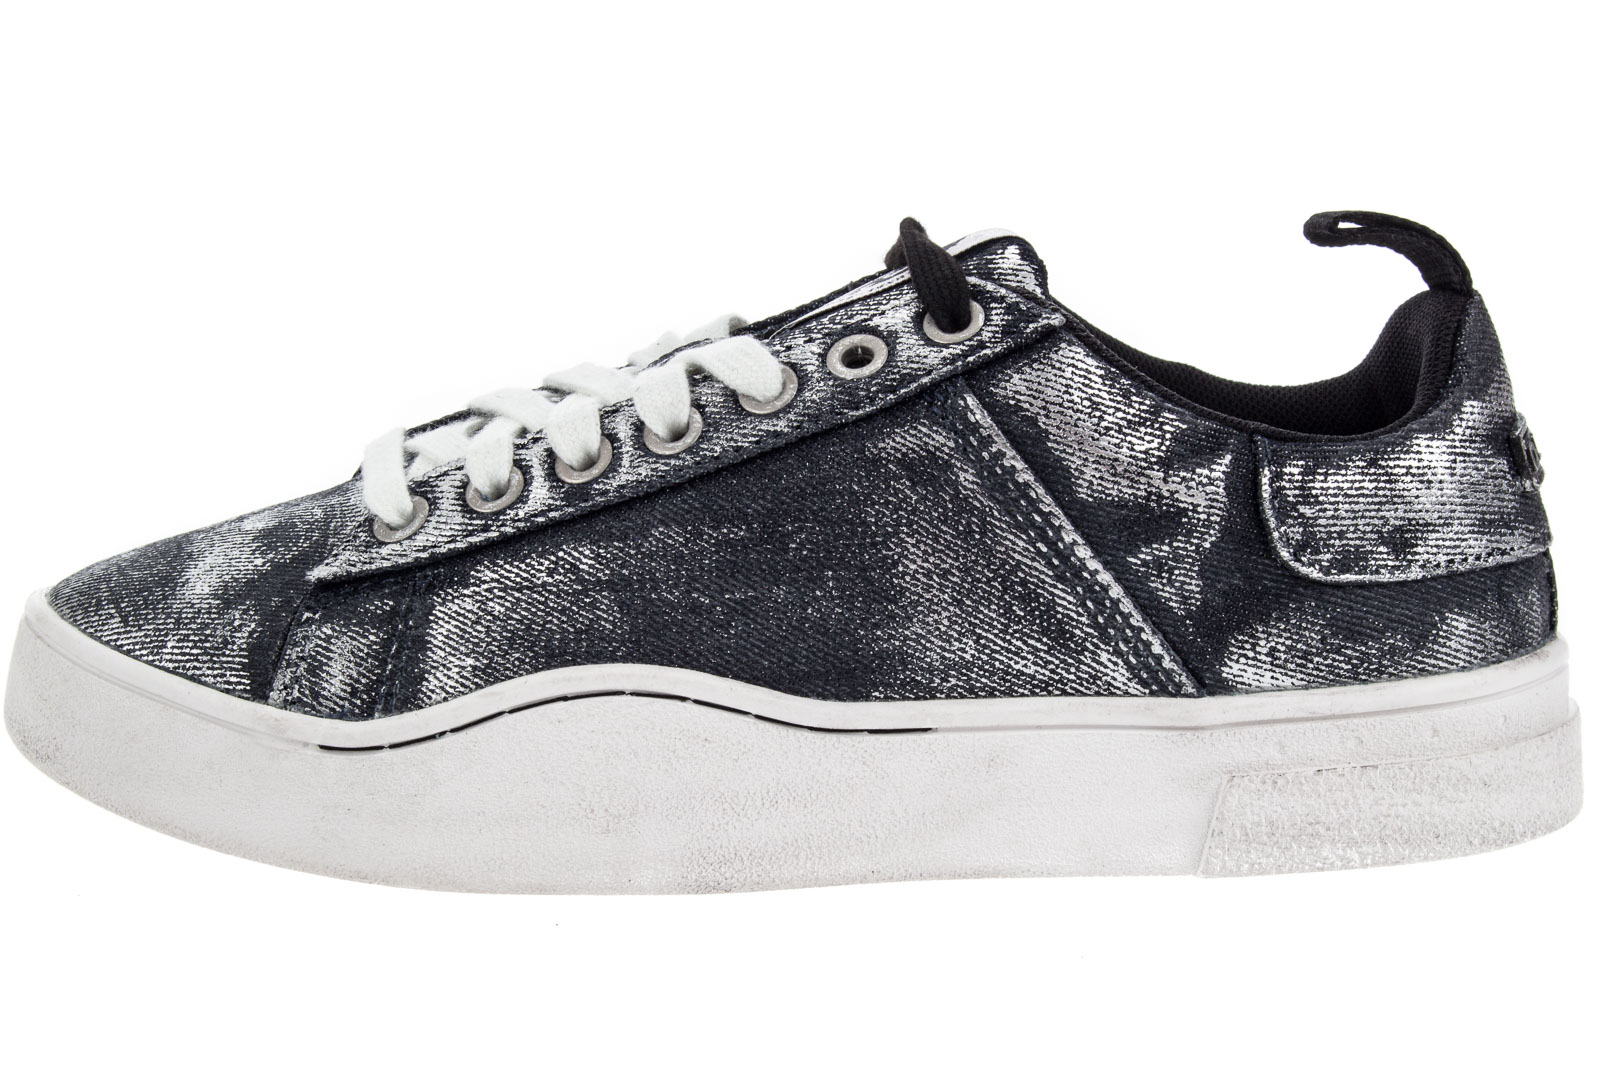 BAUDACH & SCHUSTER   DIESEL Sneaker S CLEVER LOW   online kaufen